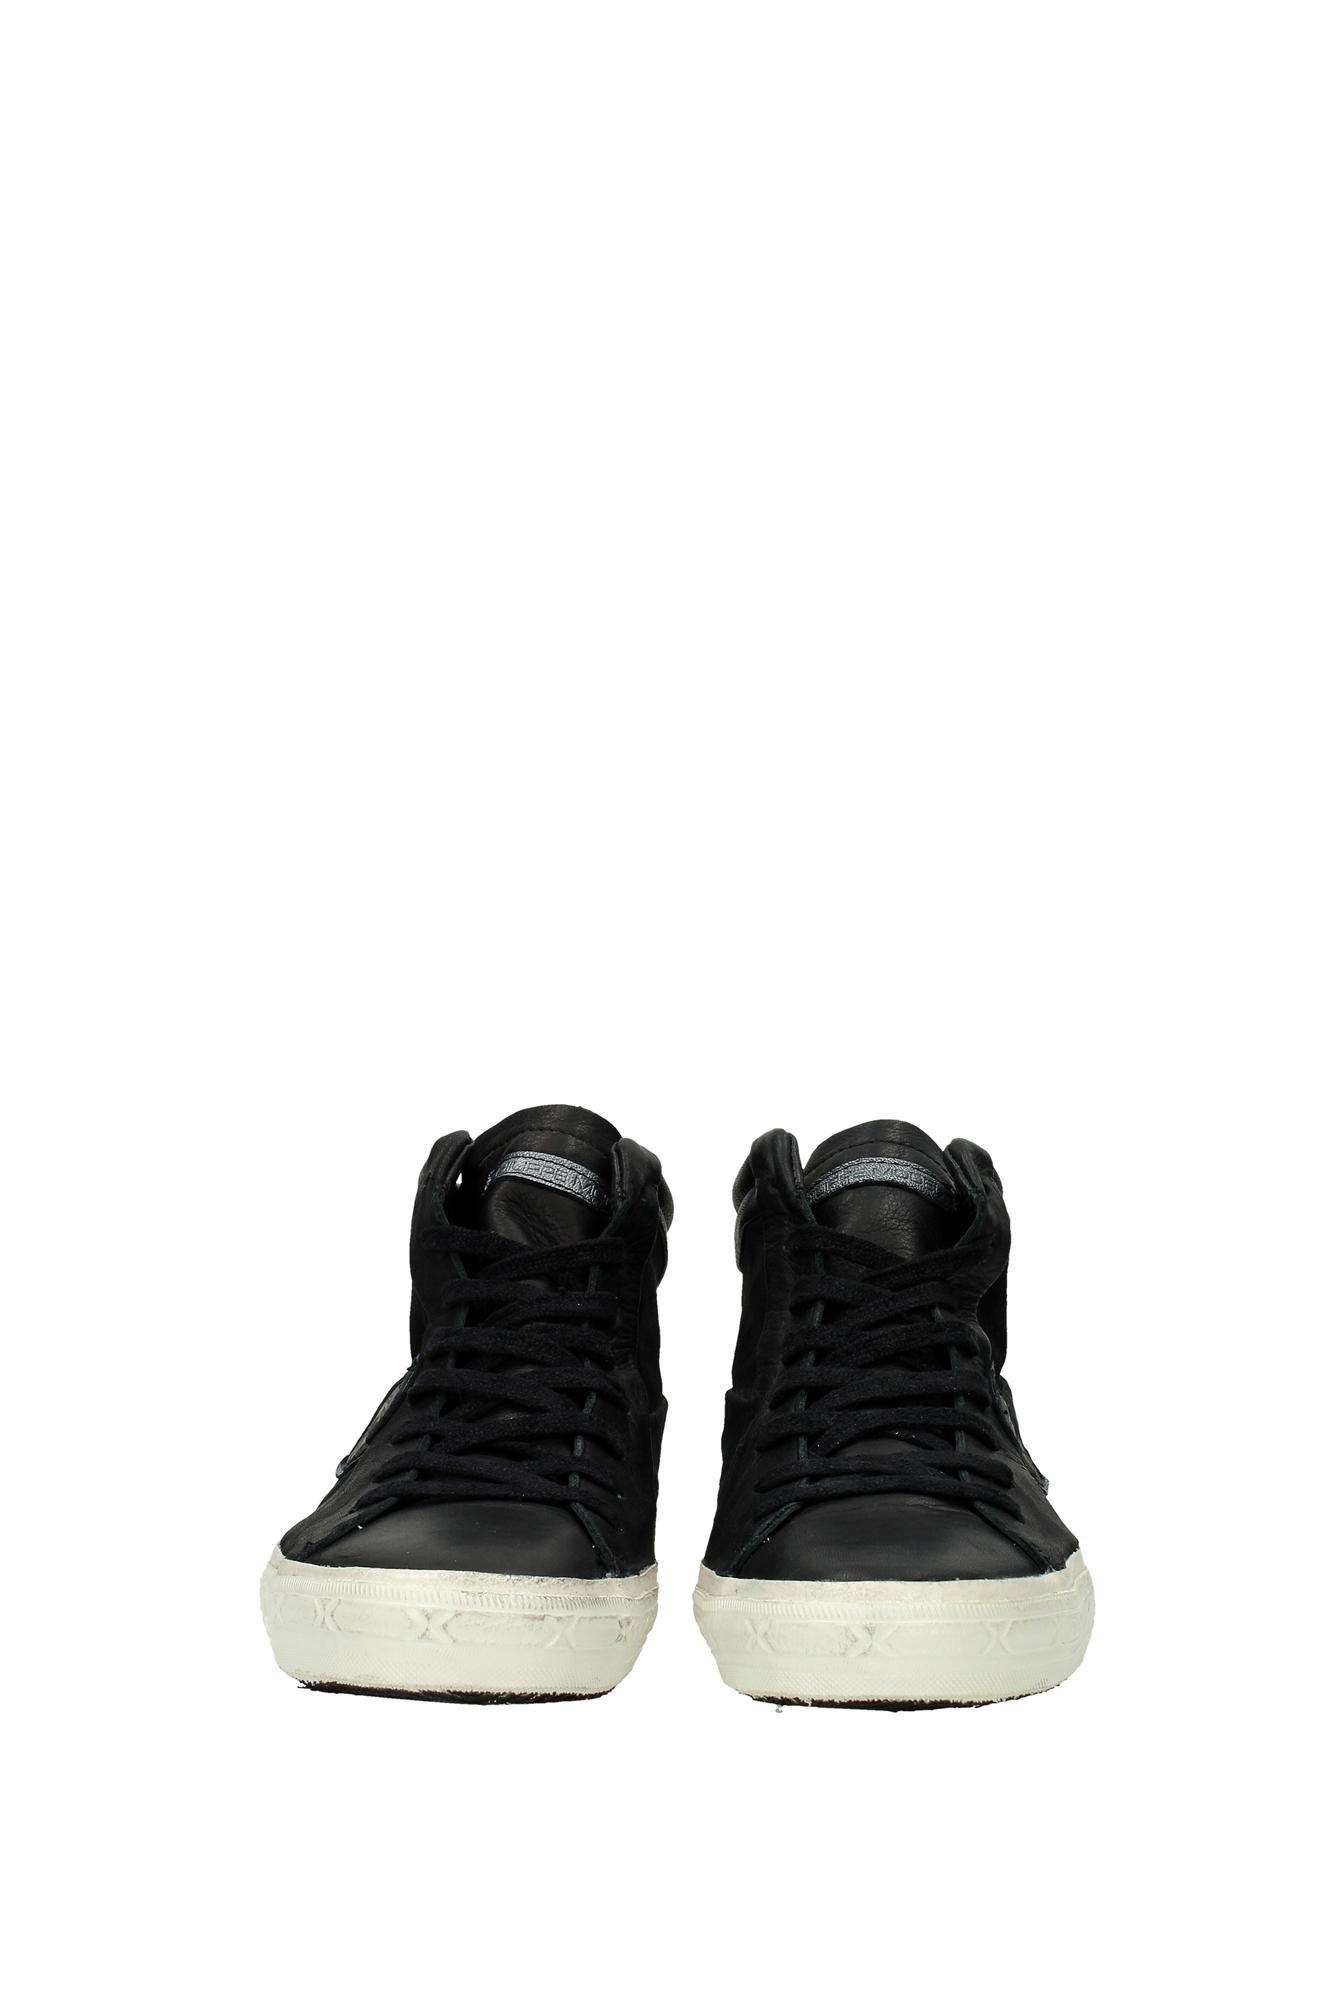 sneakers philippe model herren leder schwarz mdhuld01 ebay. Black Bedroom Furniture Sets. Home Design Ideas